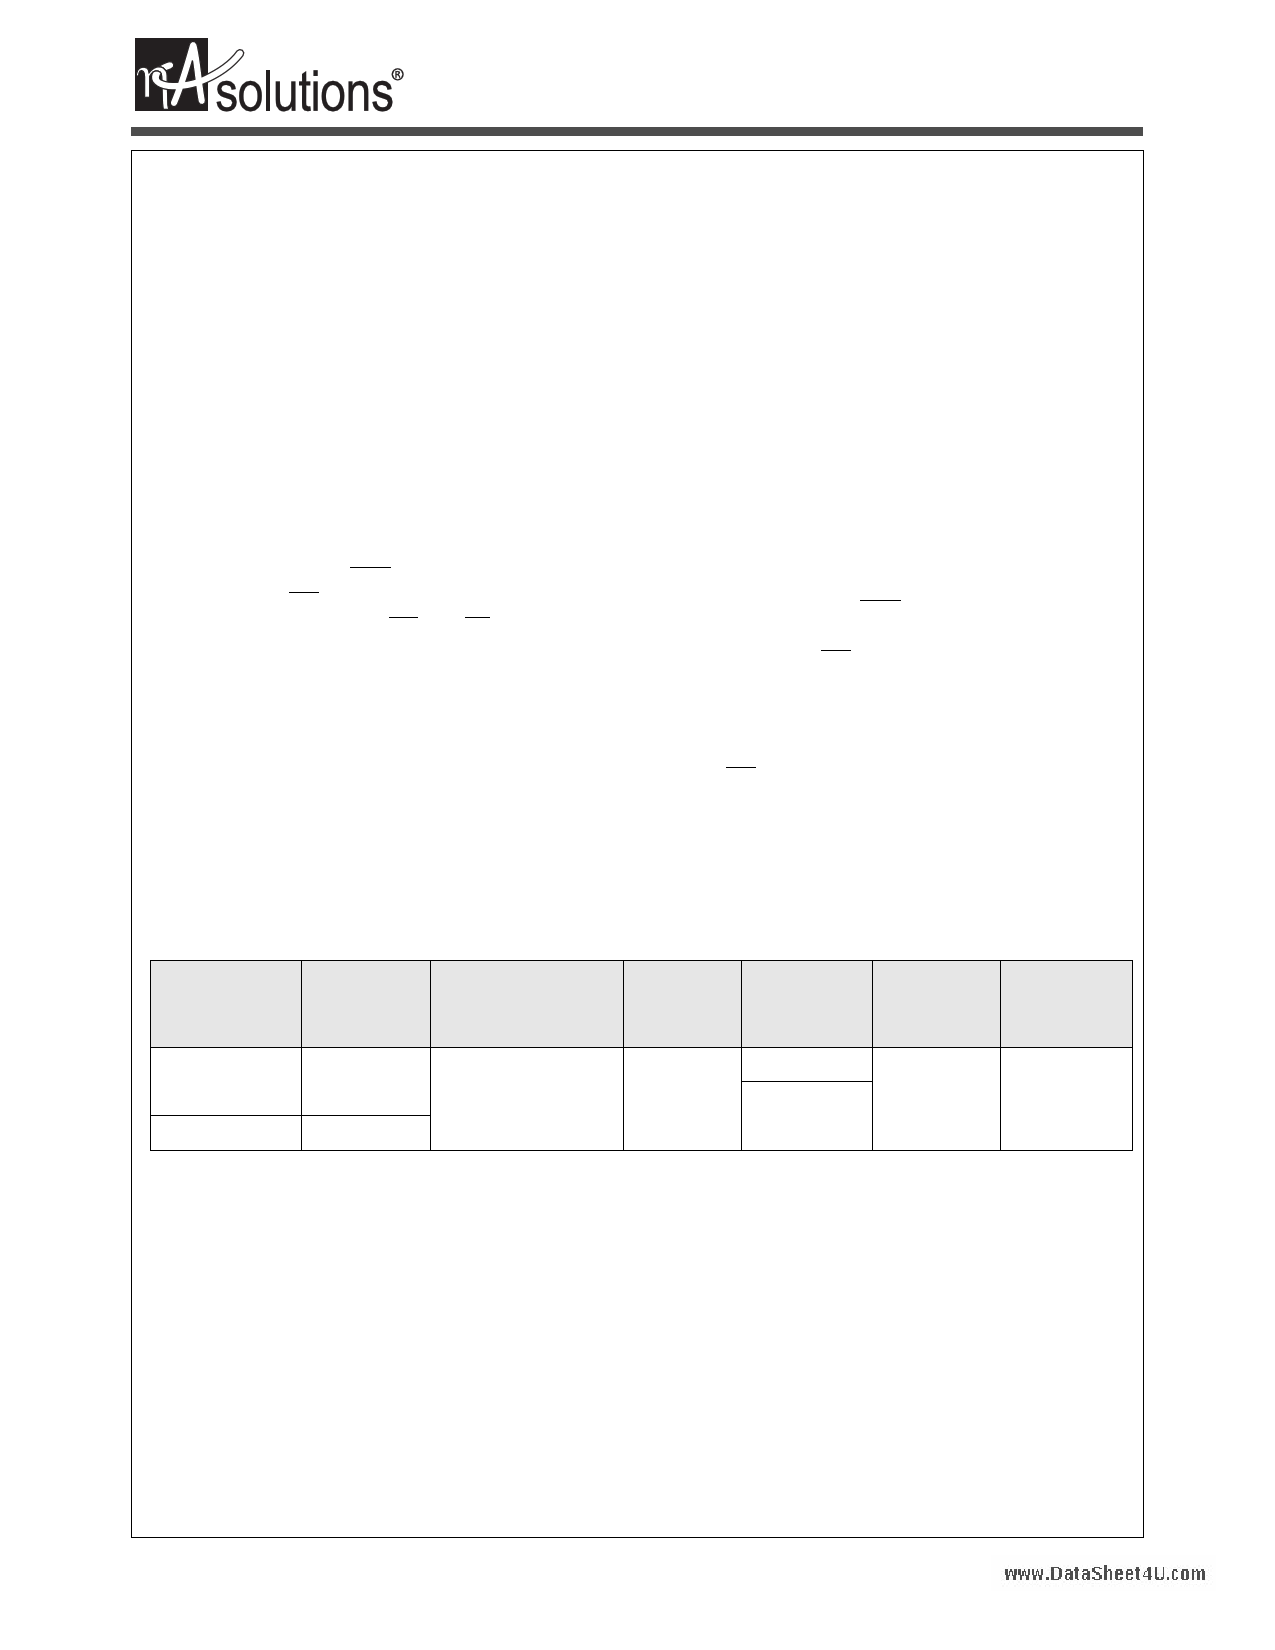 N04L1618C2A datasheet